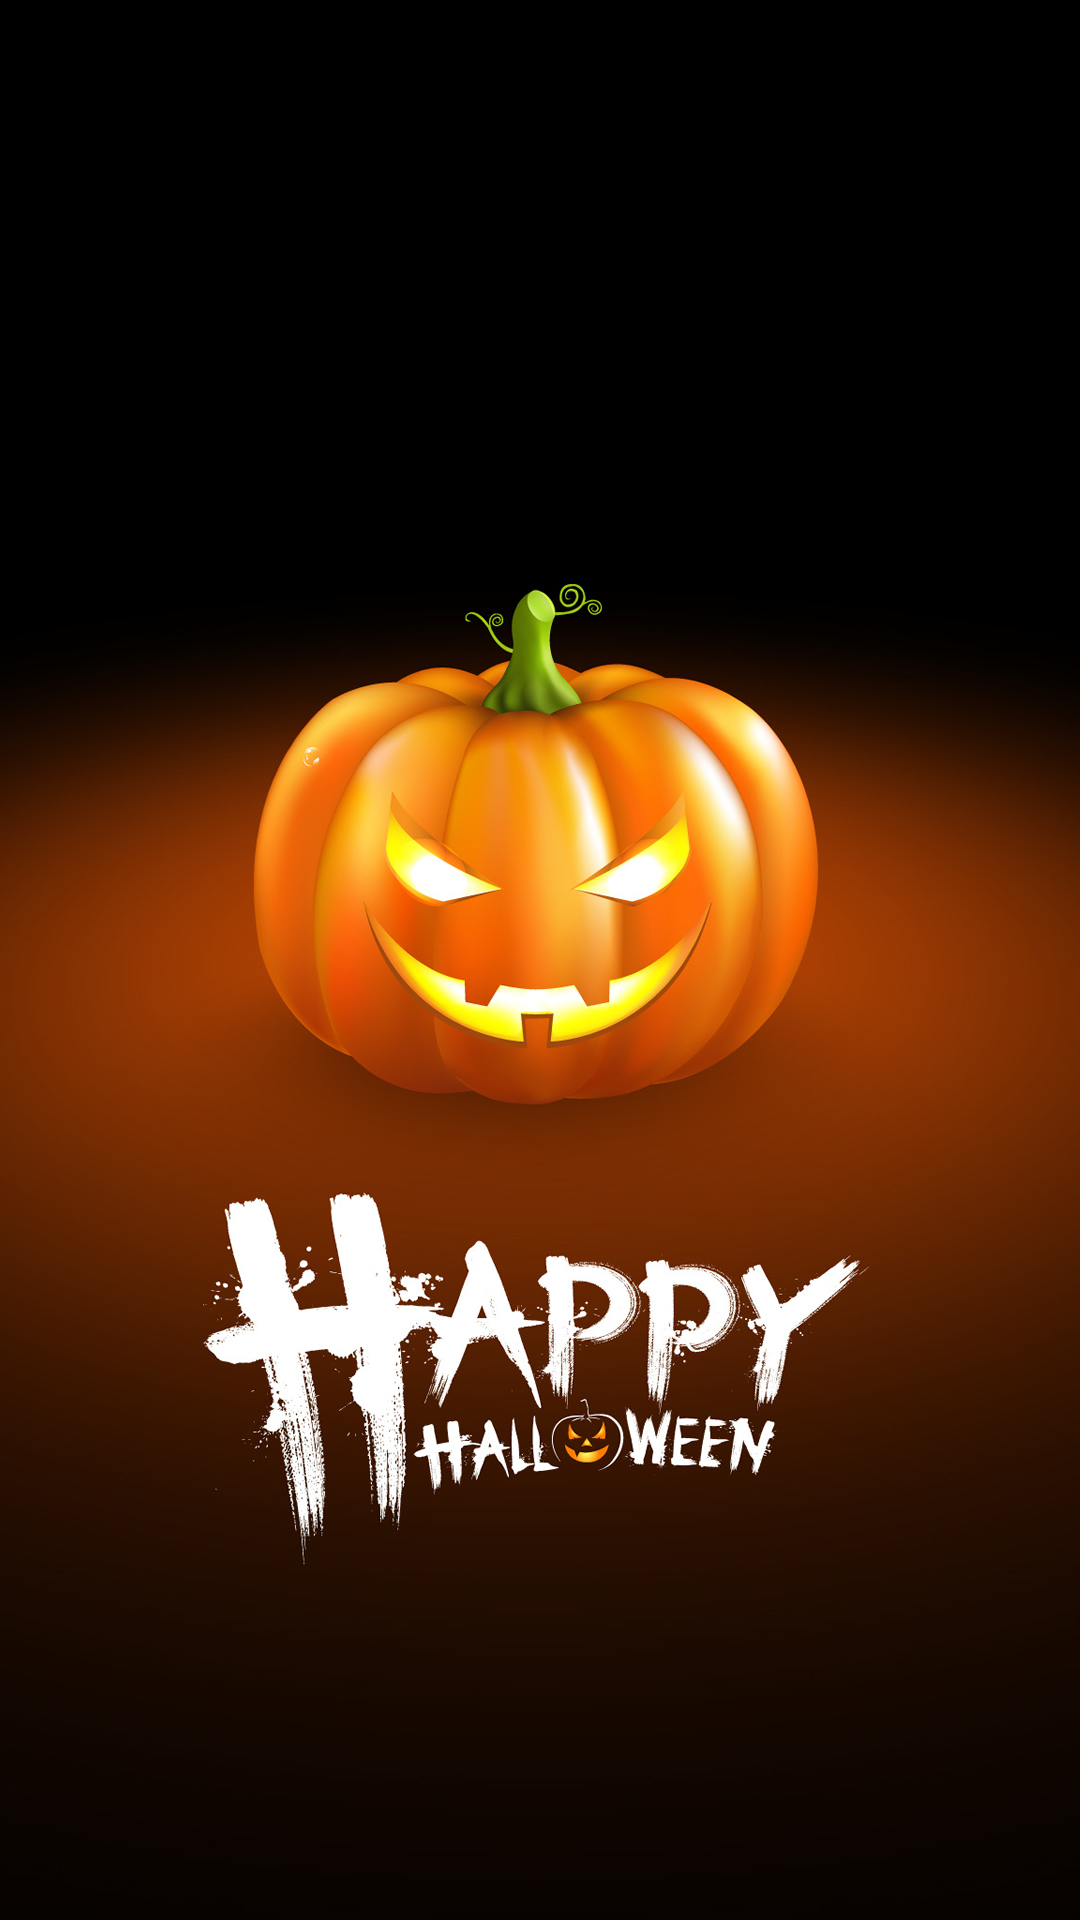 halloween eerie pumpkin dark scary carve horror lantern fright